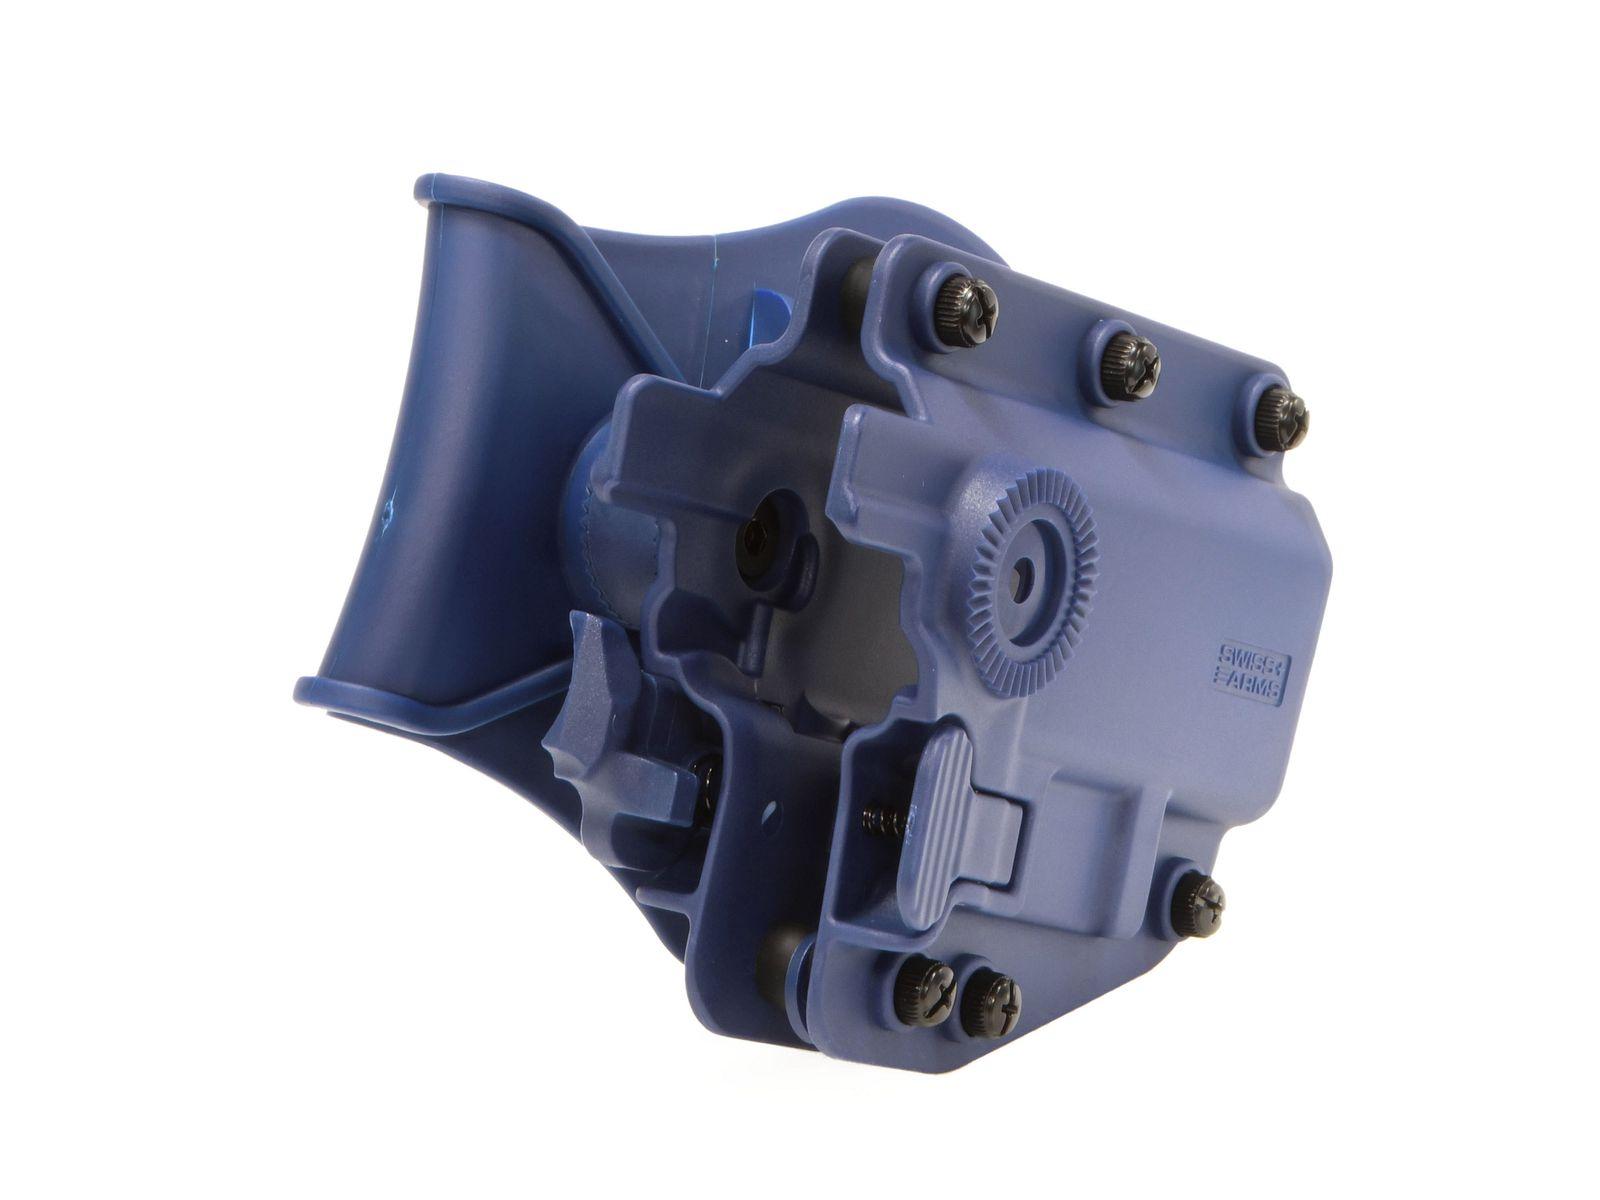 CyberGun SwissArms Universalホルスター ADAPT-X Level3 (Blue)